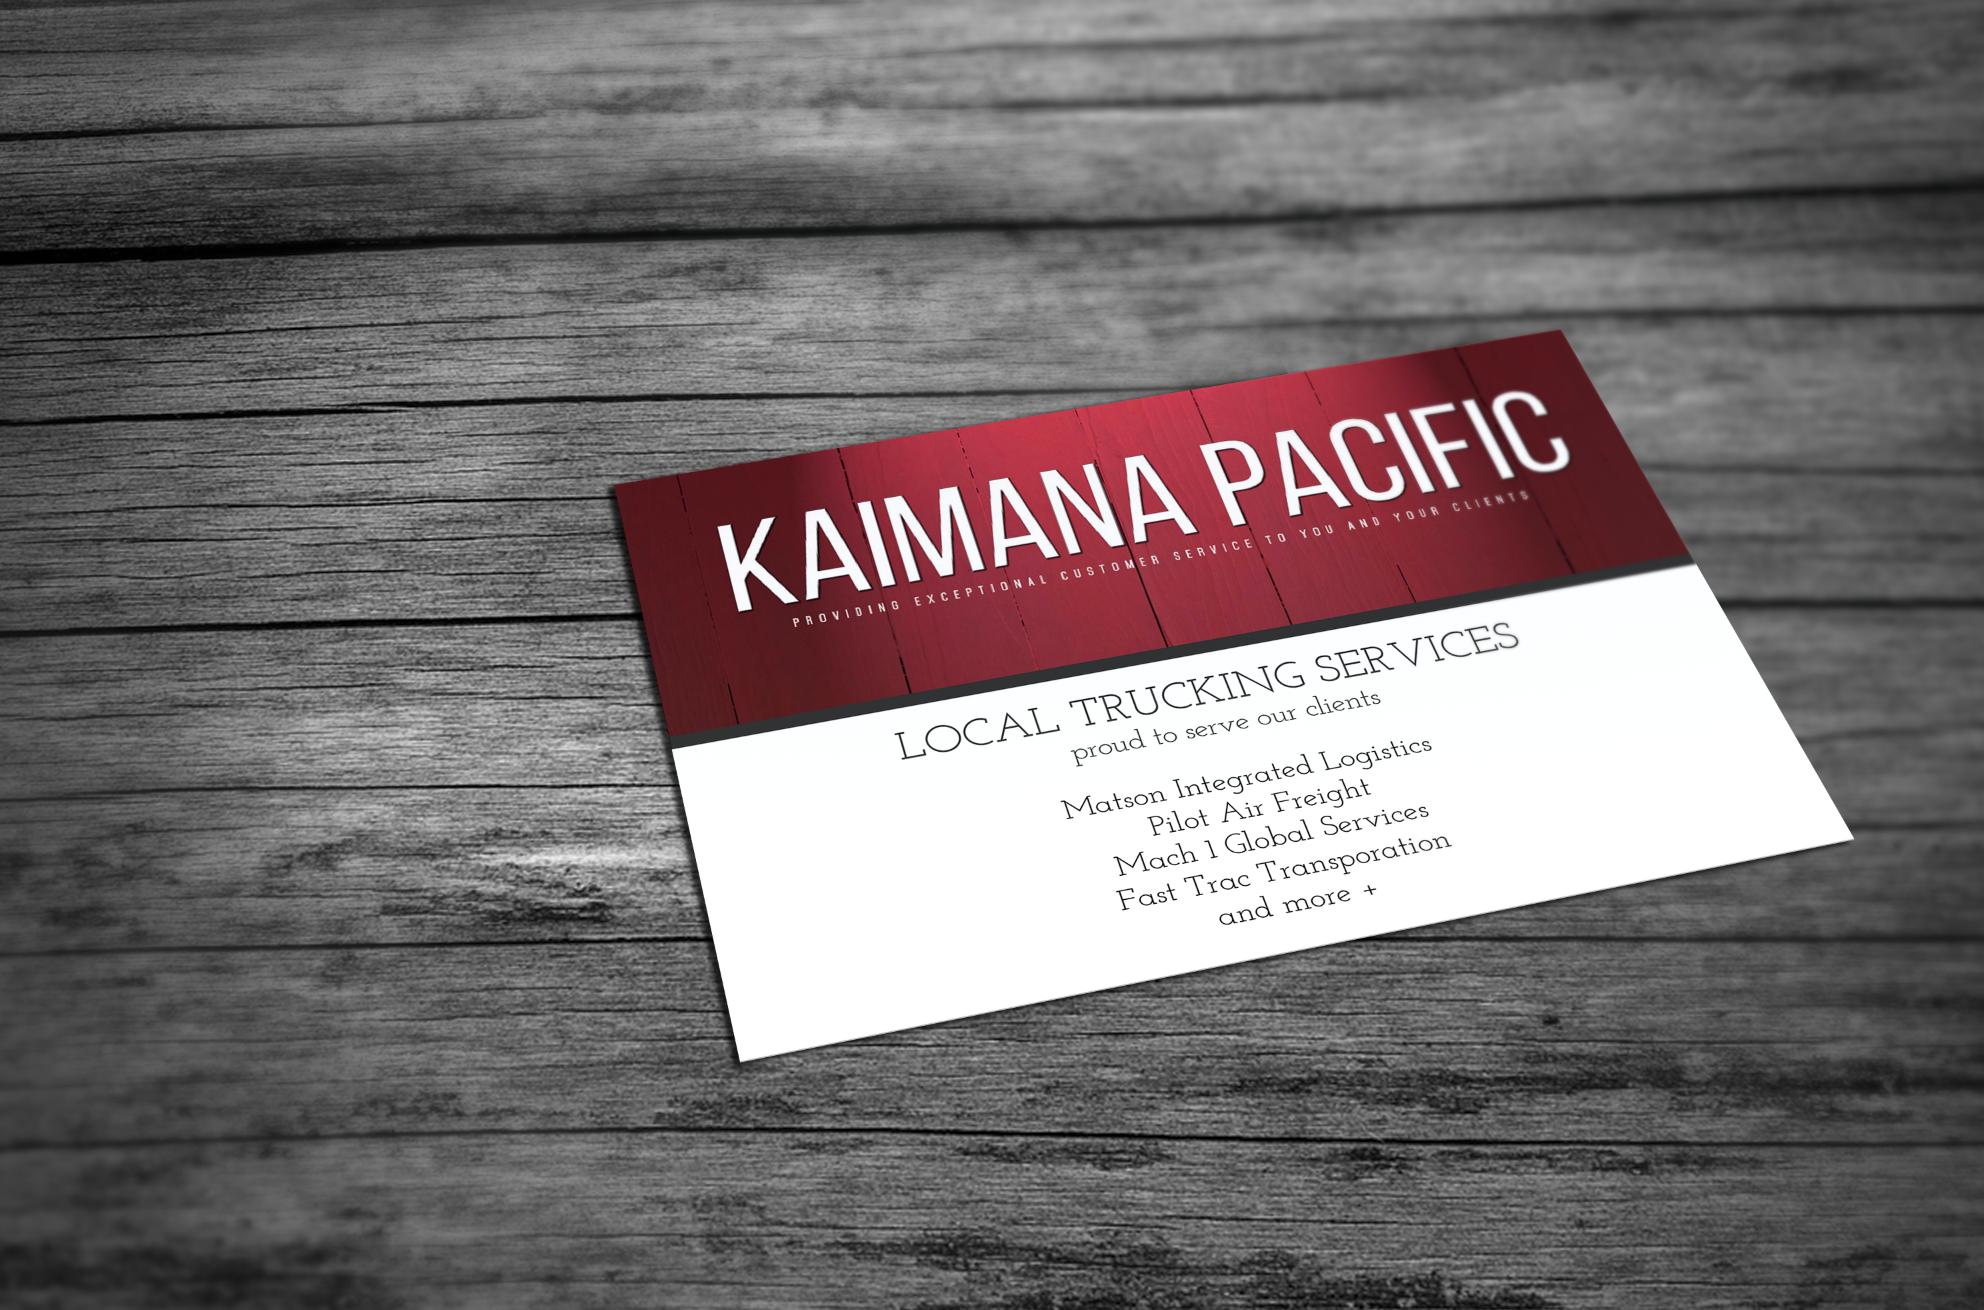 Kaimana Pacific, Inc.